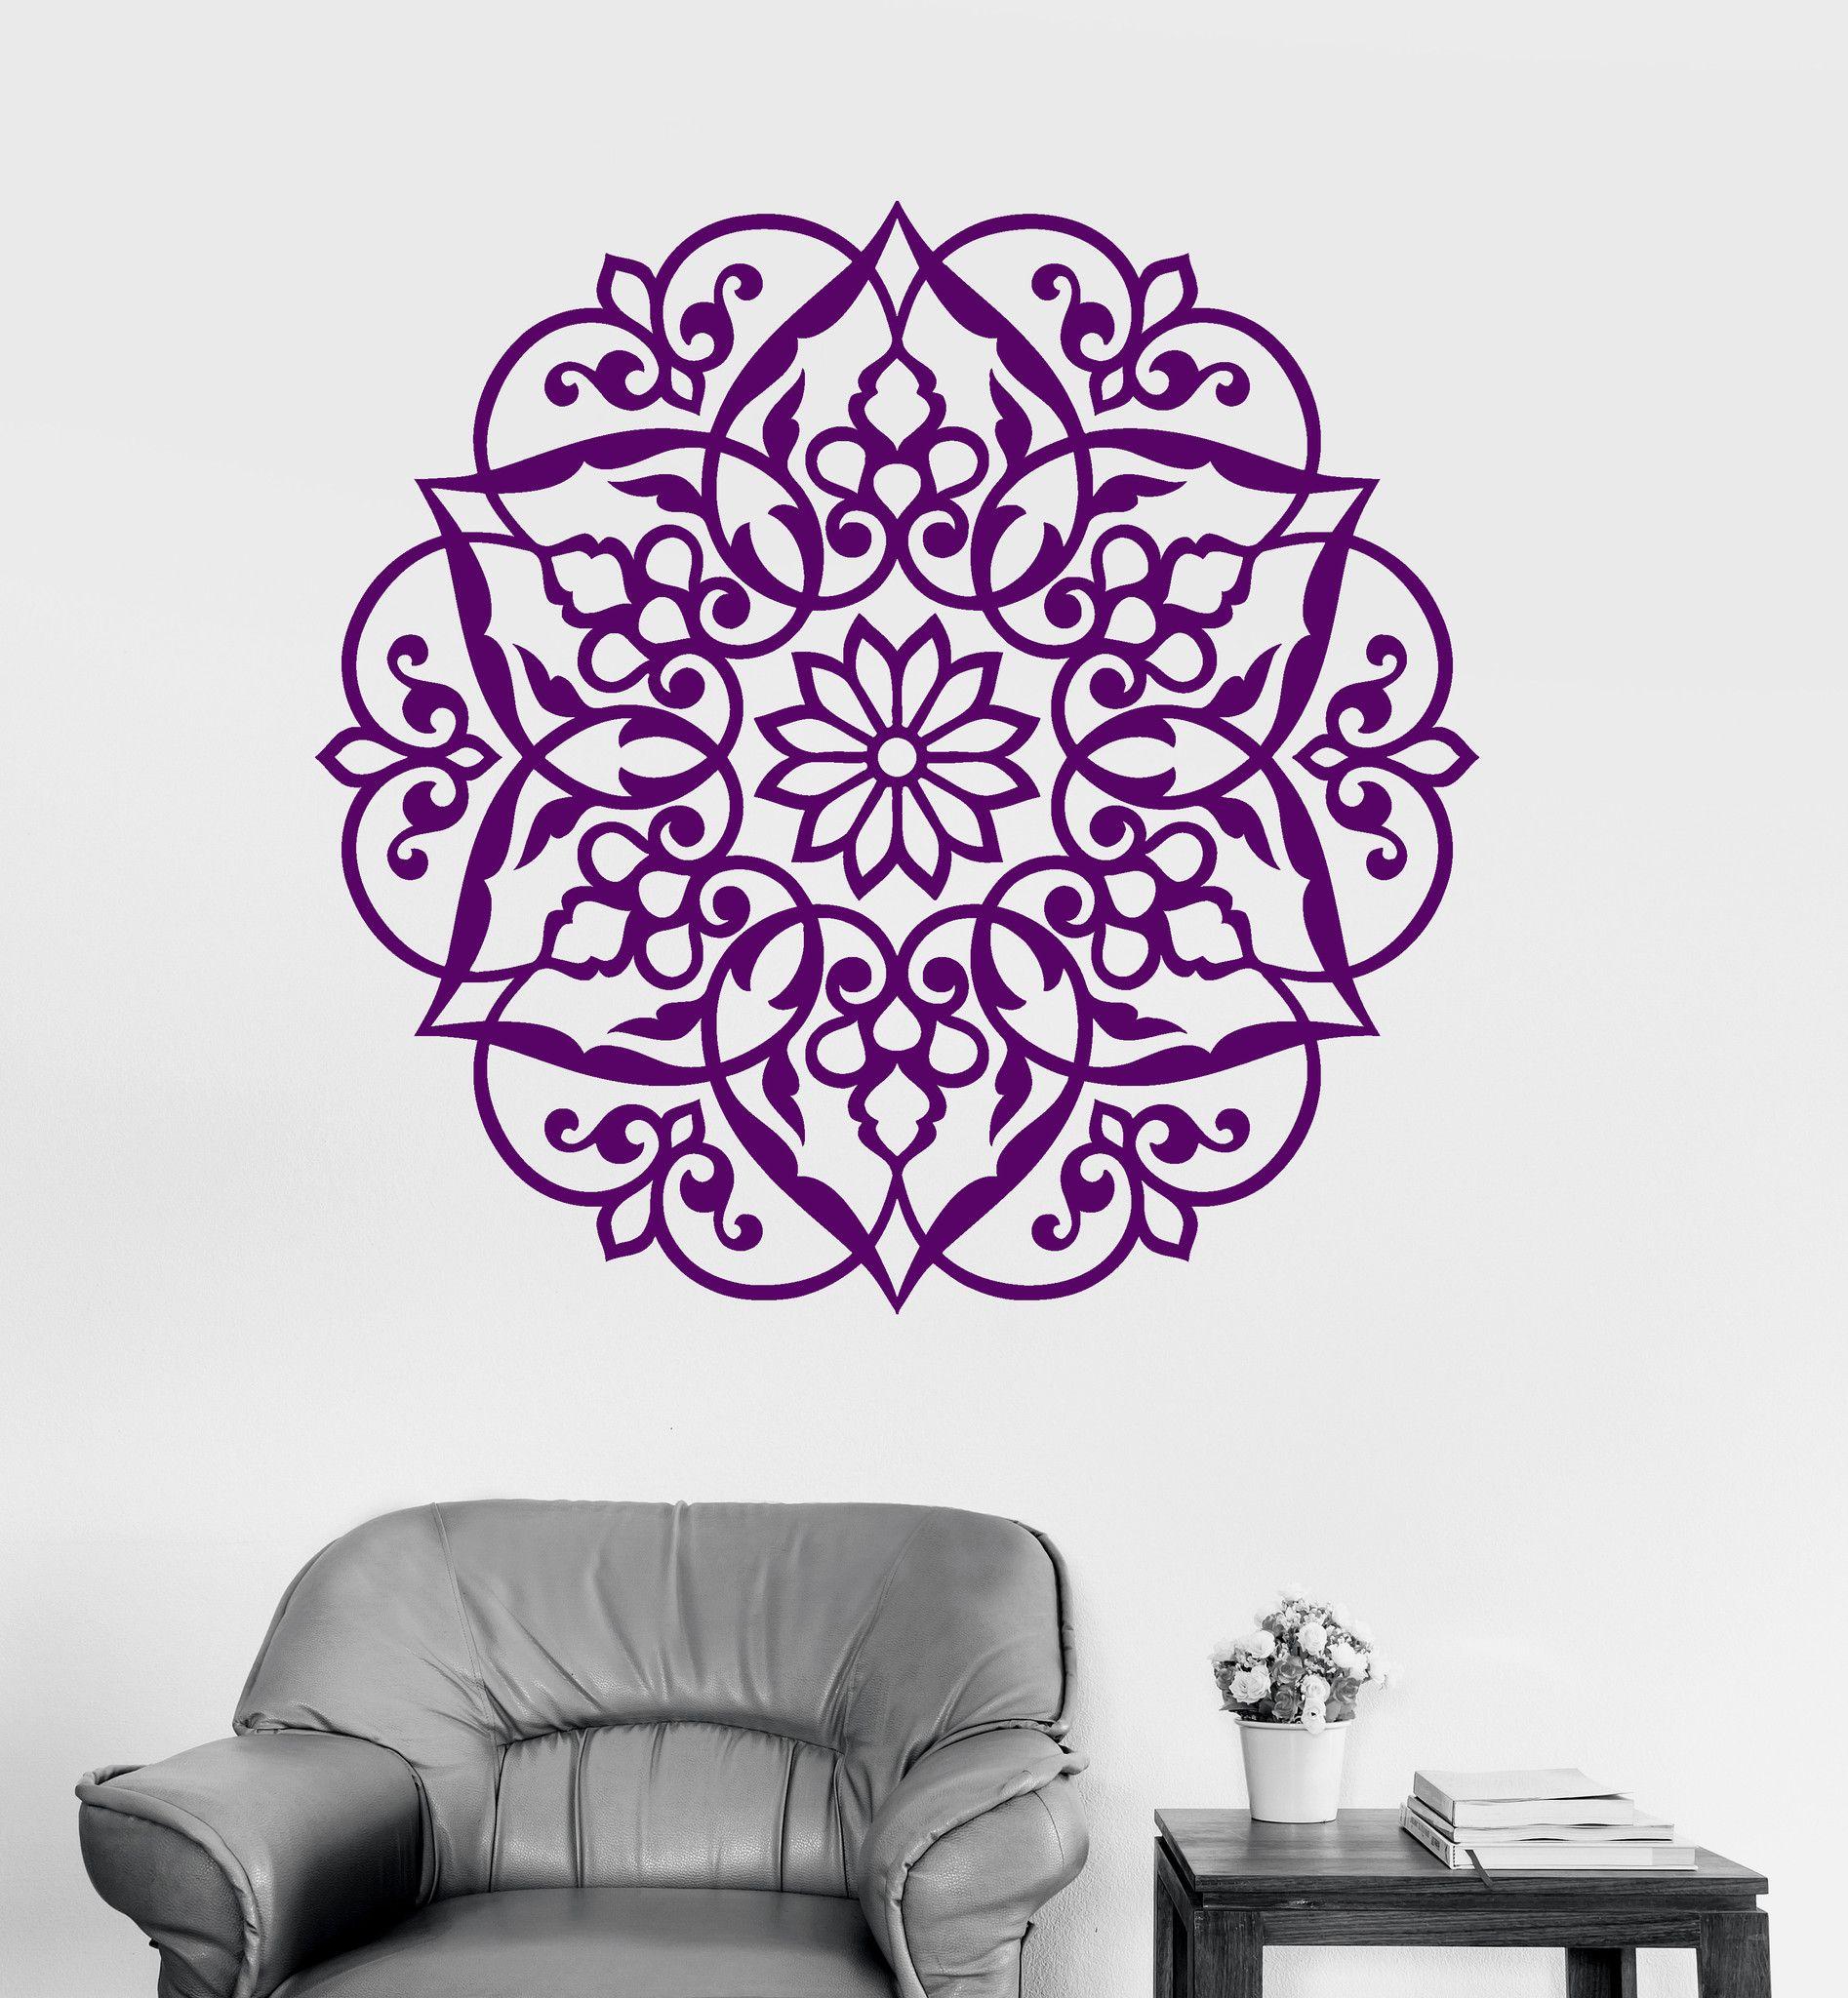 Vinyl Wall Decal Lotus Mandala Ornament Bedroom Decor Buddhism Stickers Ig3472